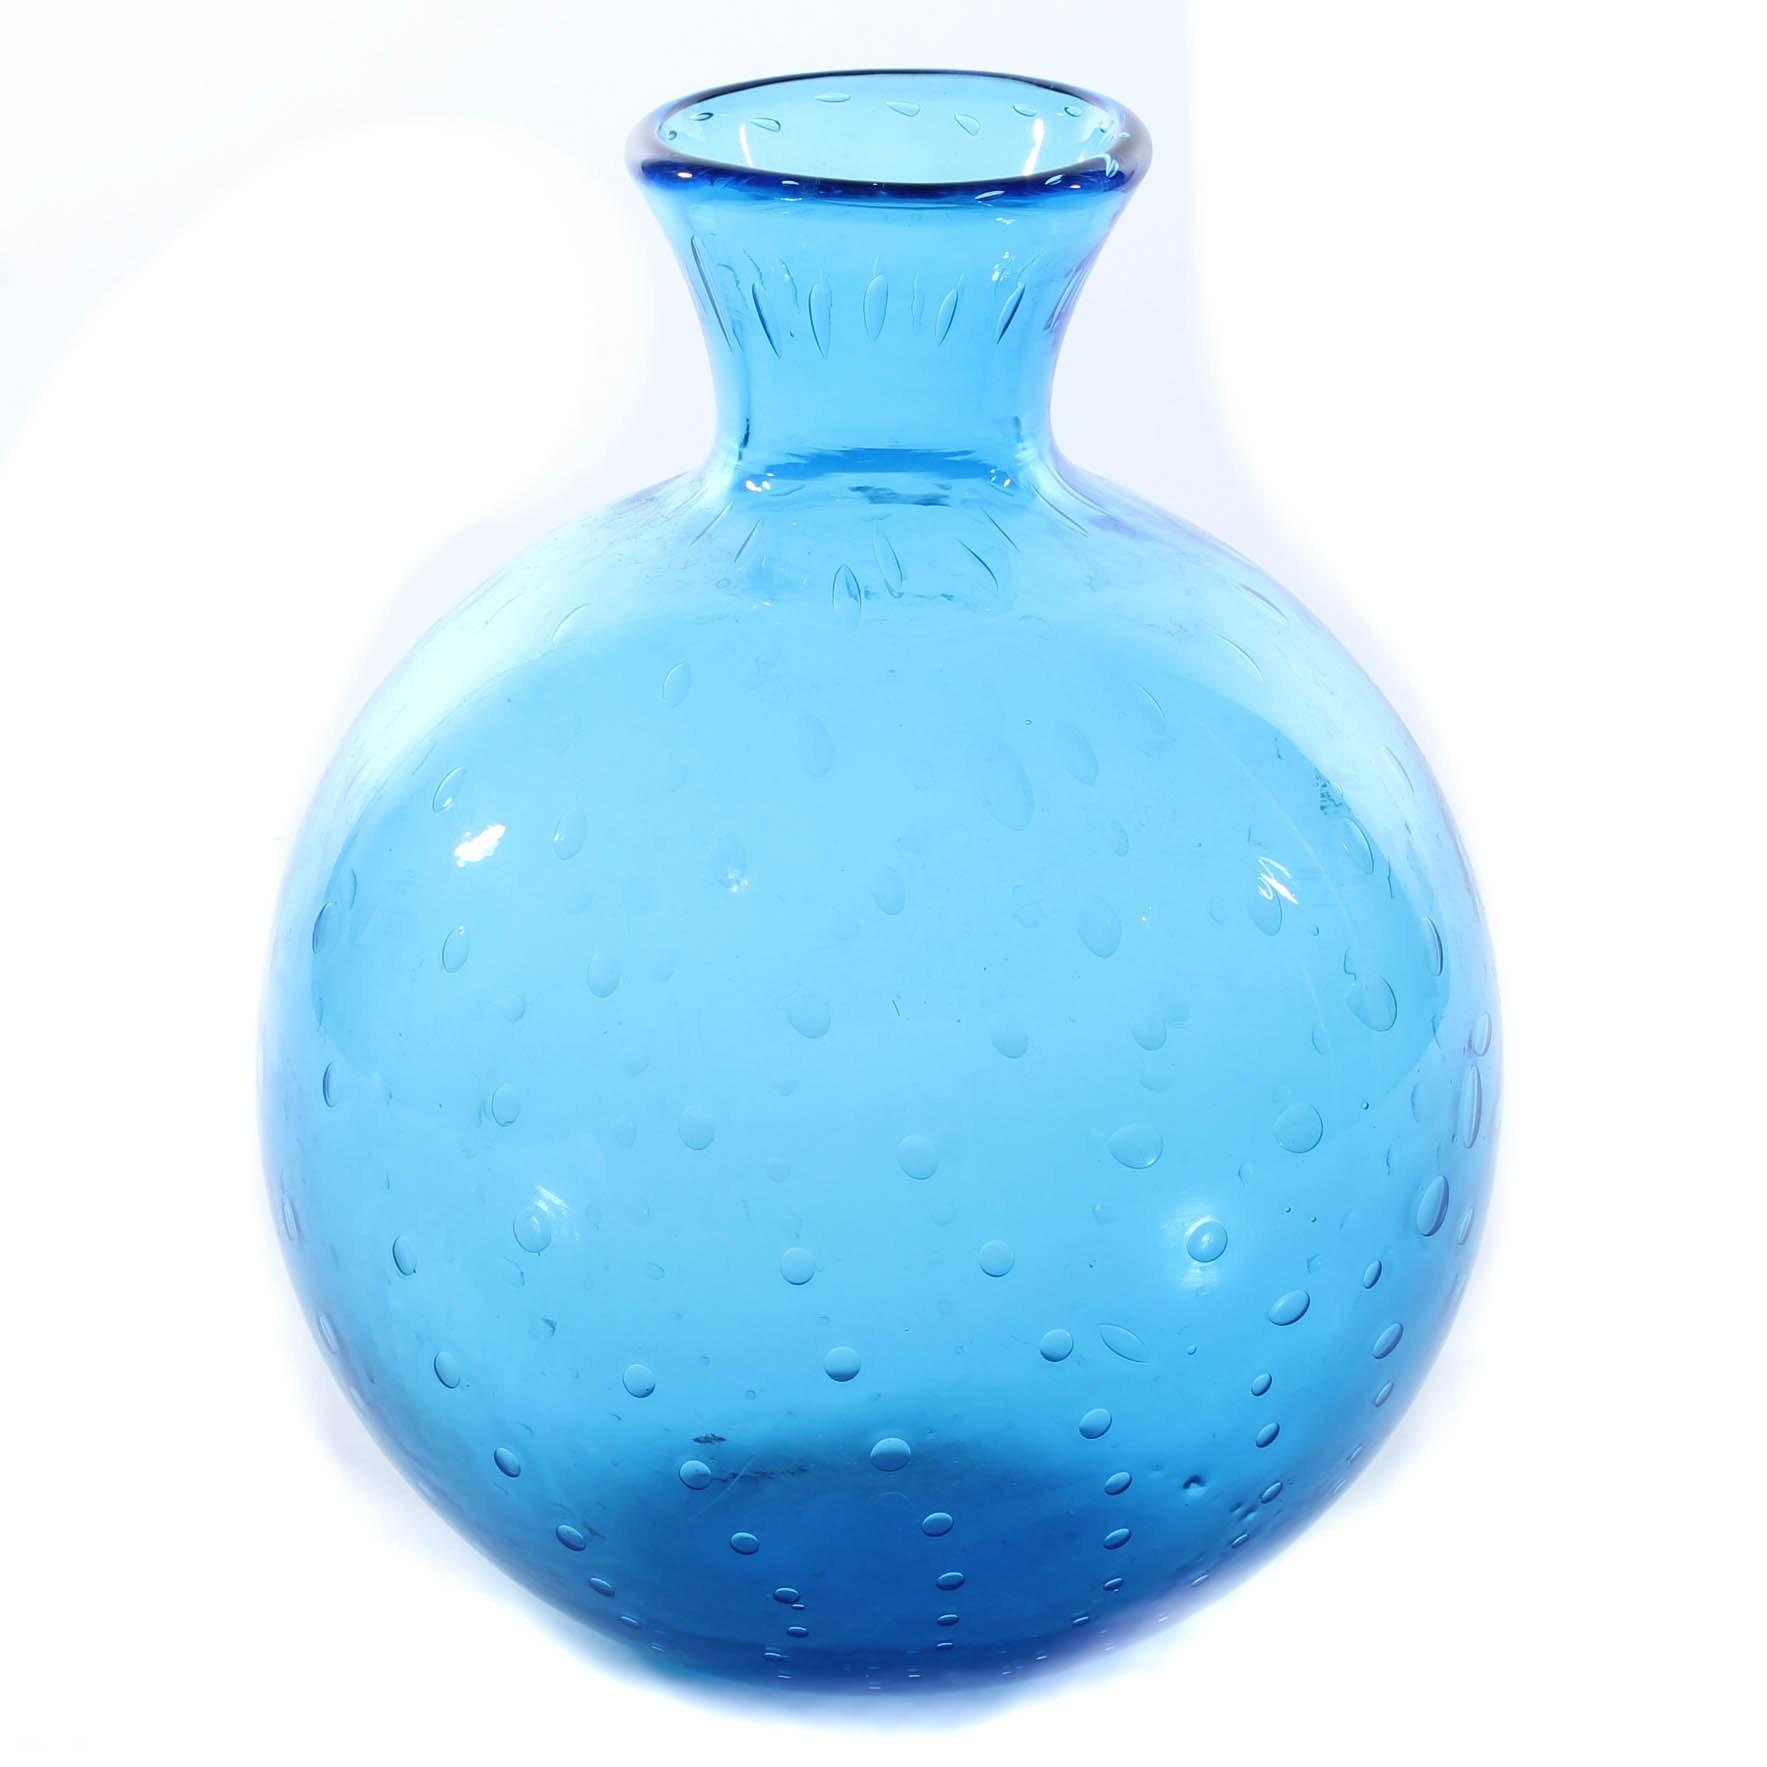 Blenko Hand-Blown Controlled Bubble Art Glass Vase